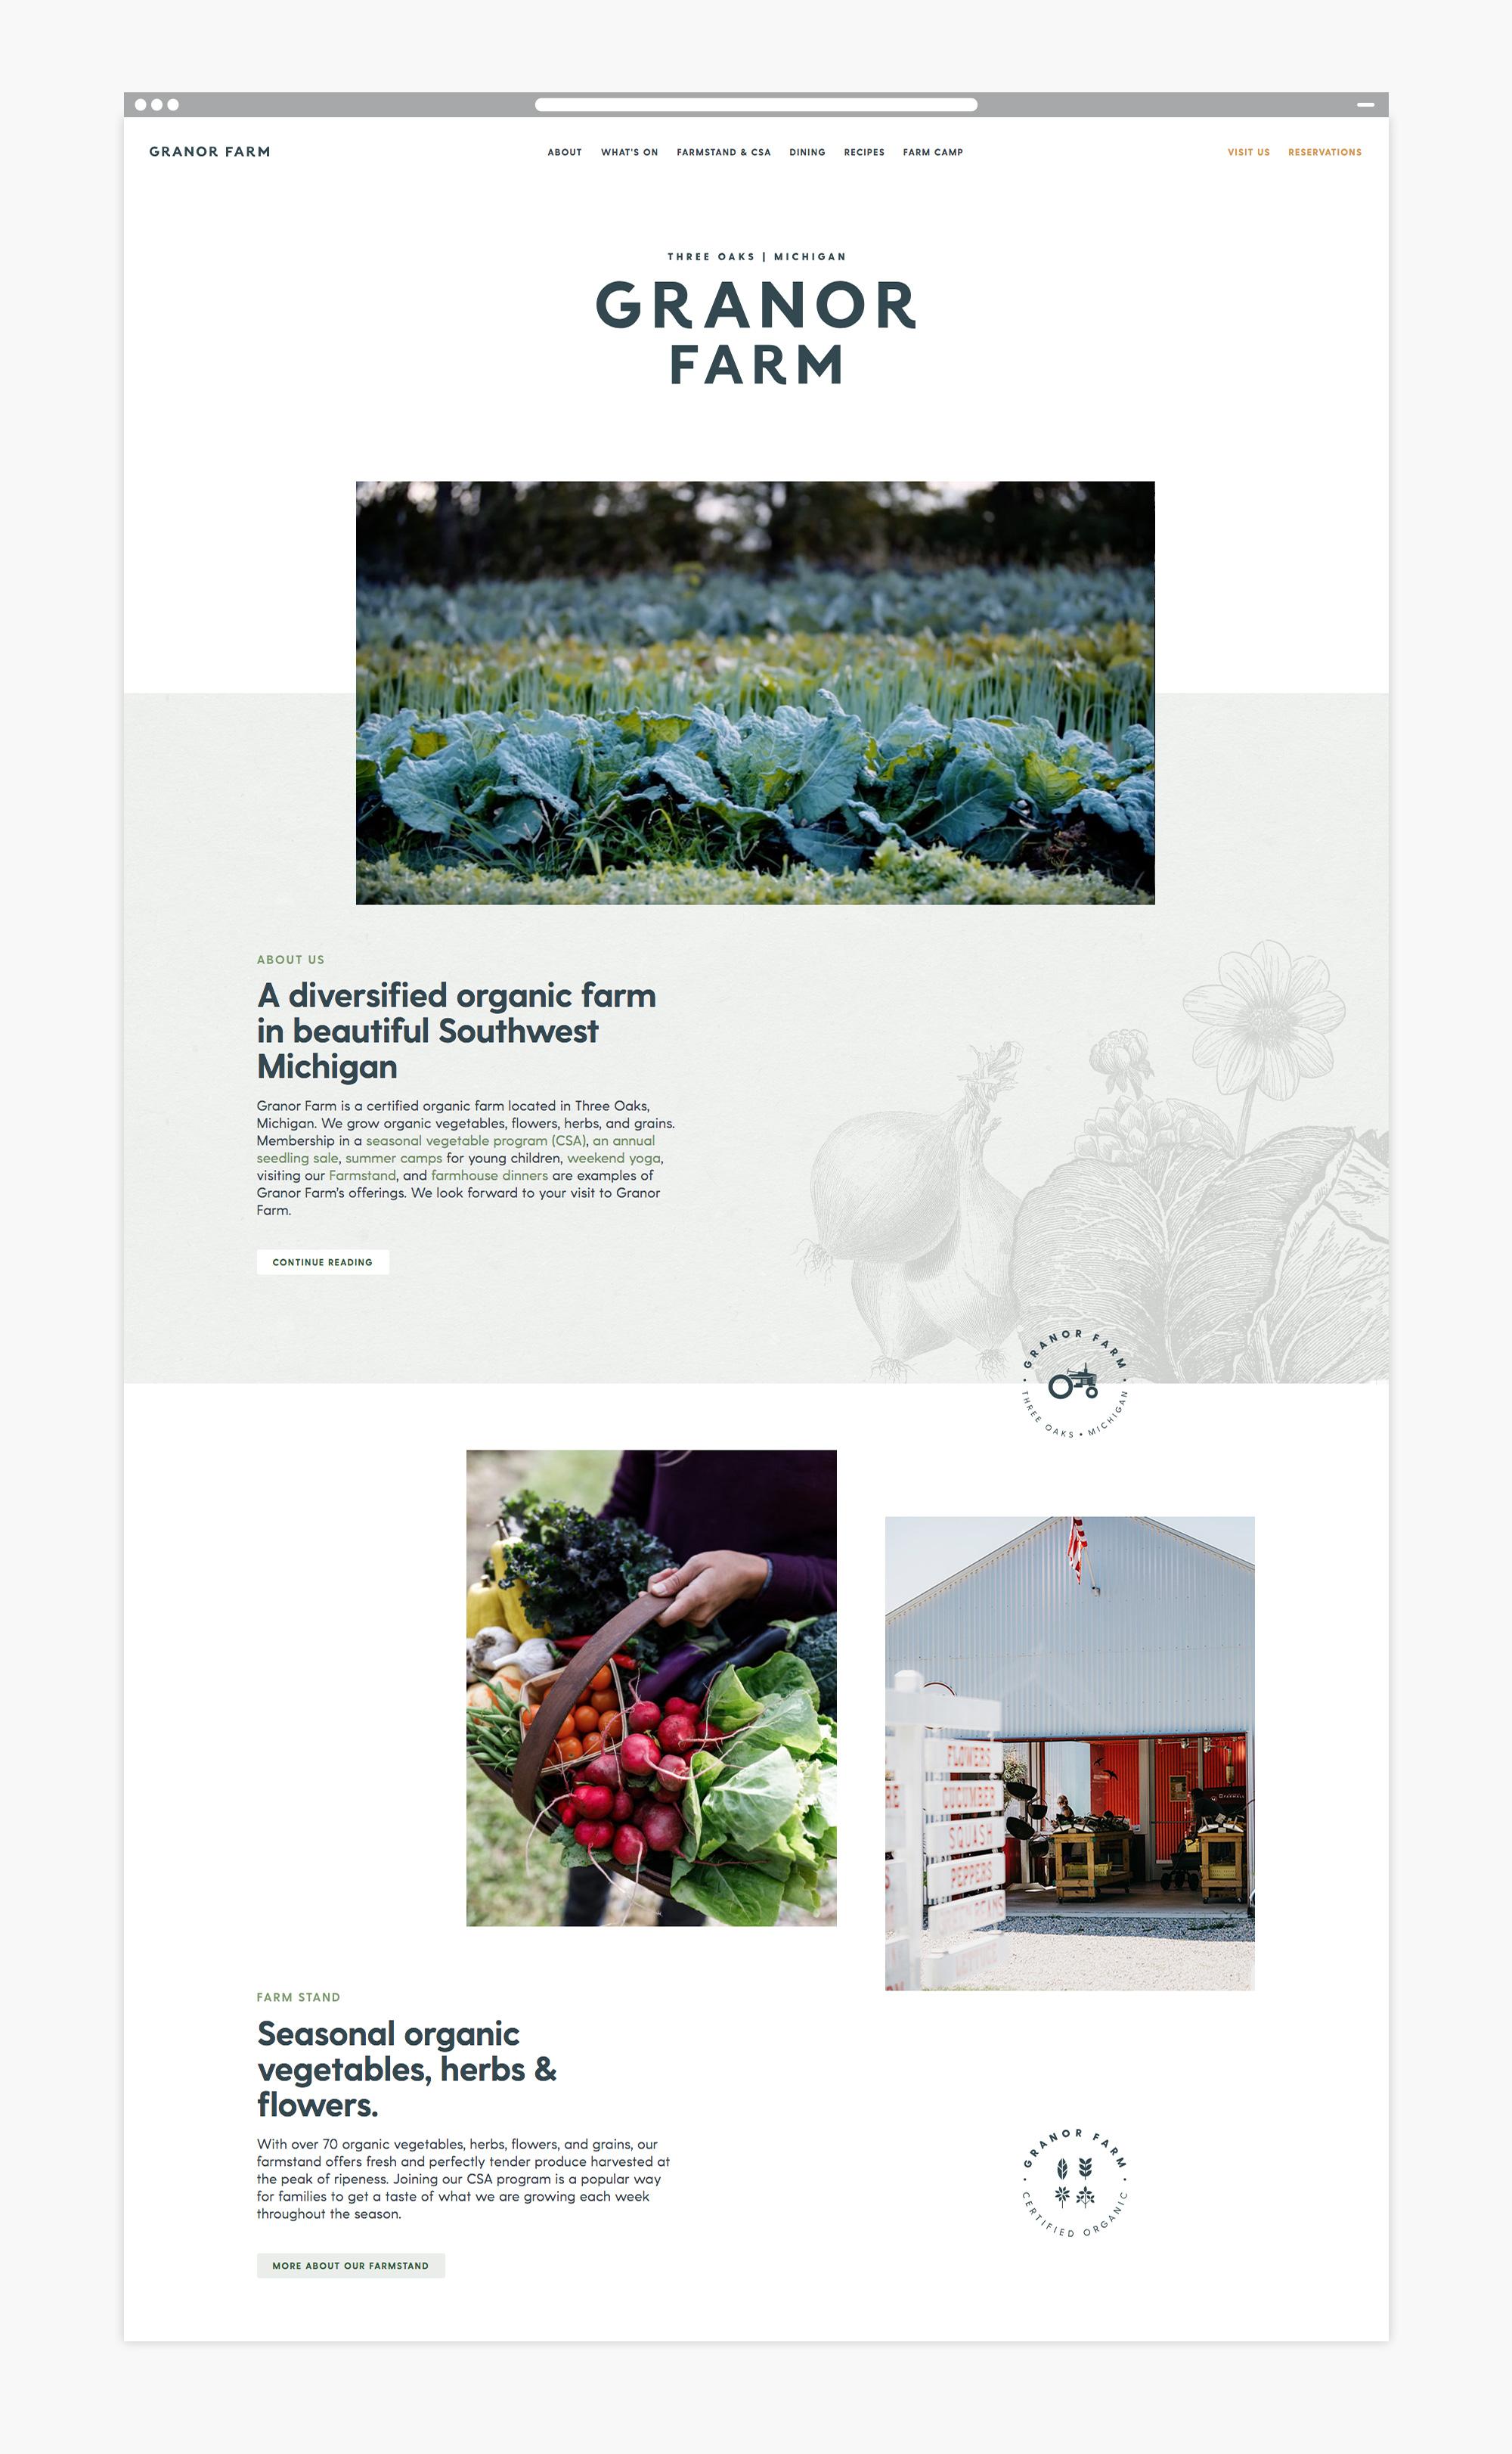 One Darnley Road Granor Farm Website 02 V3